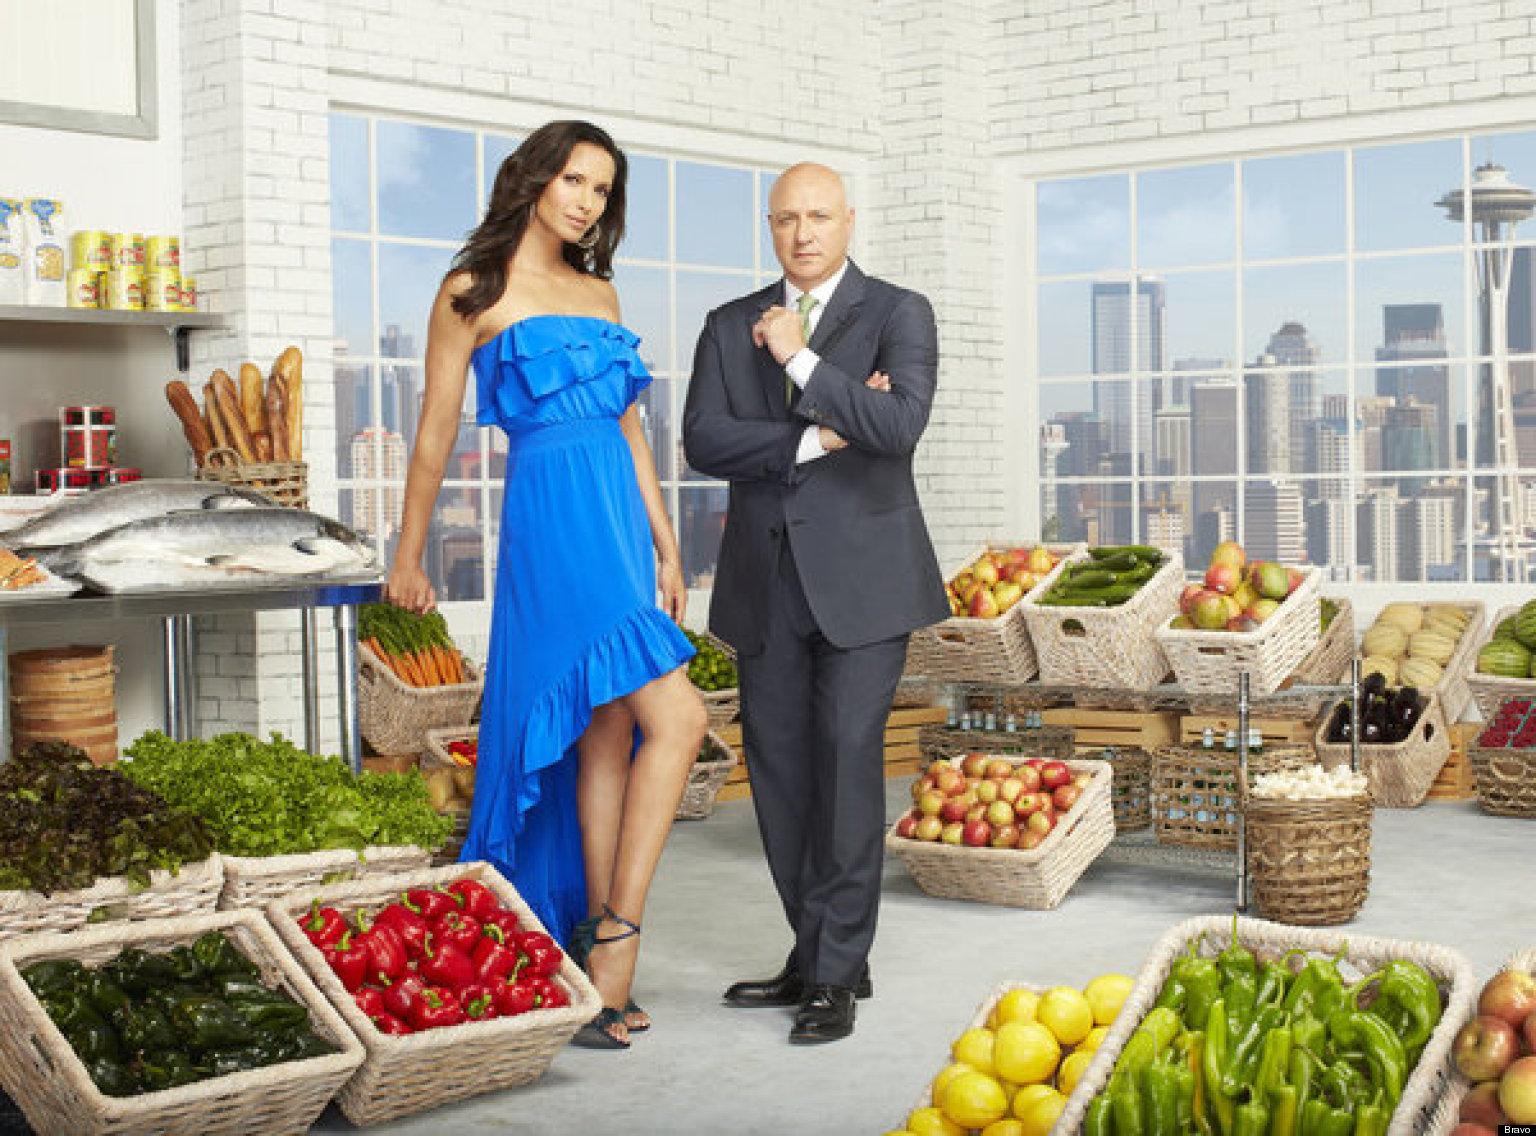 'Top Chef' Season 11: Bravo Renews Cooking Competition